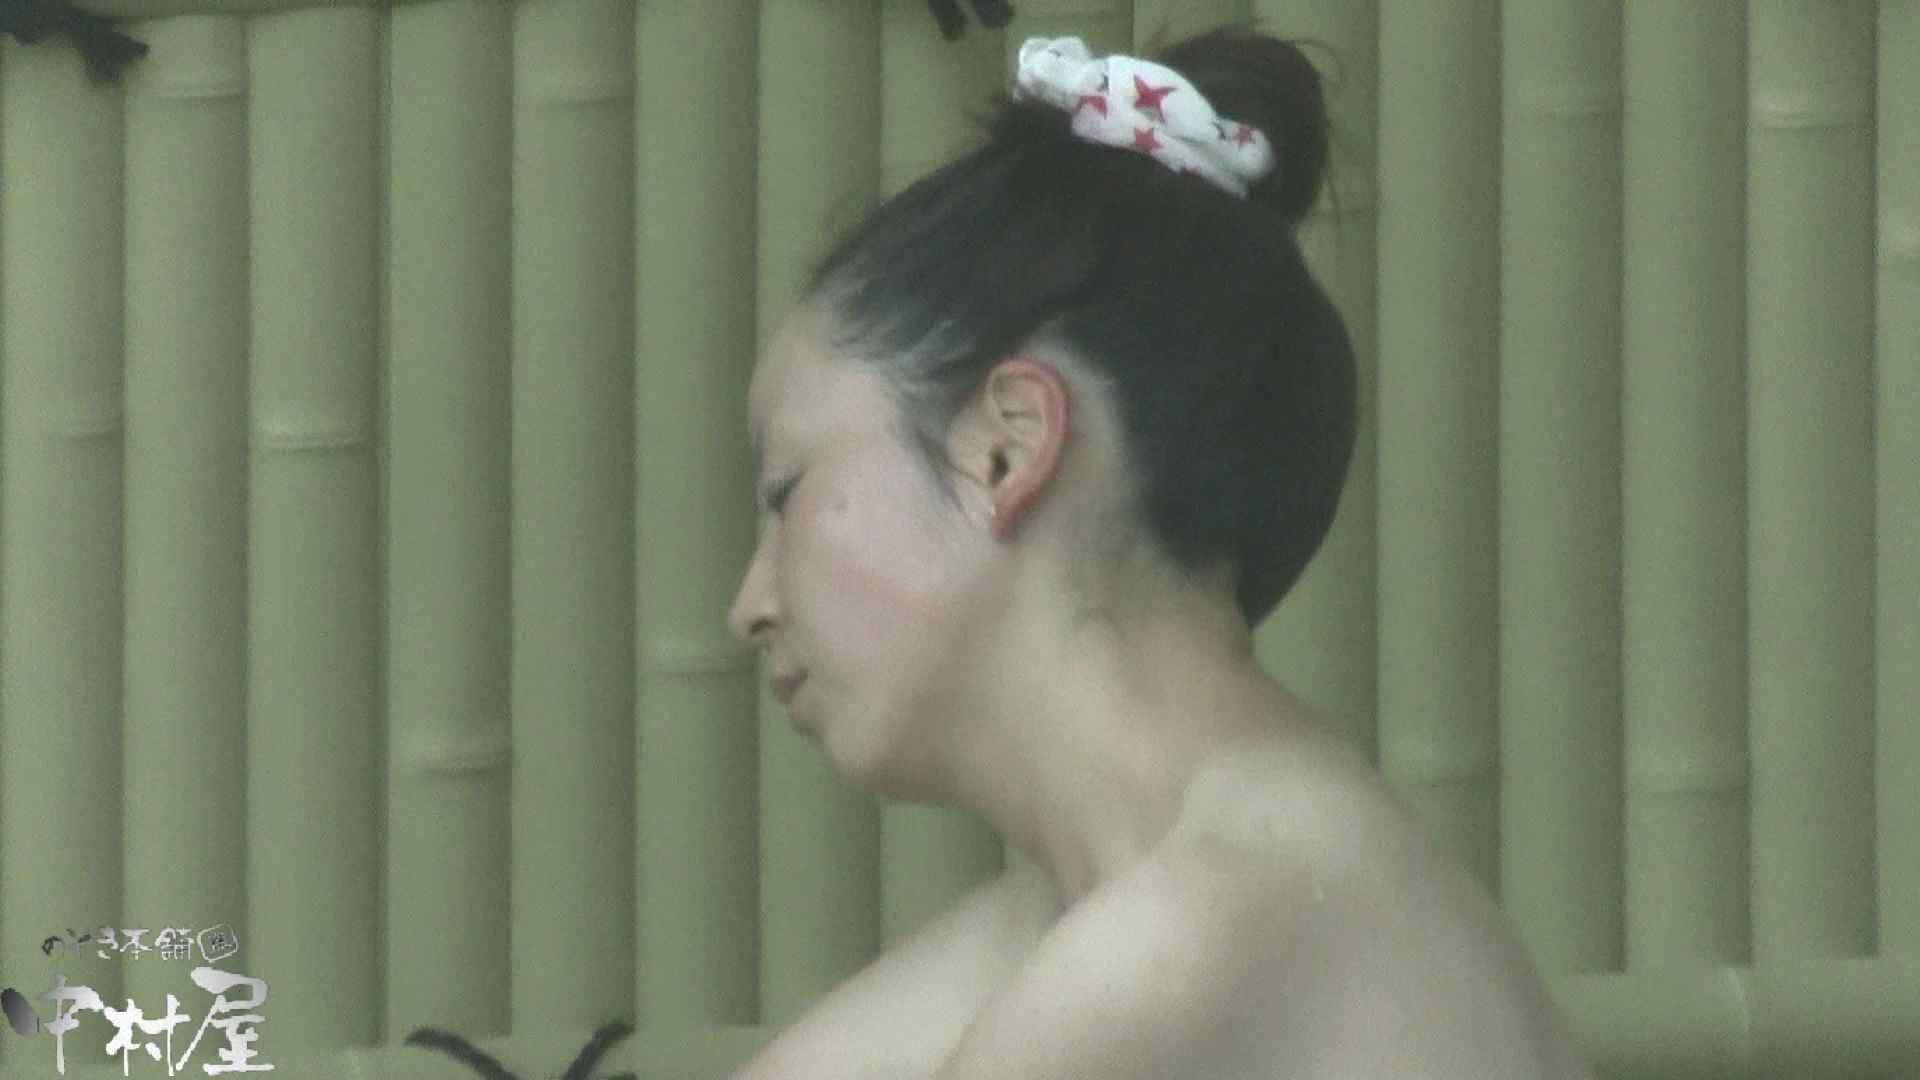 Aquaな露天風呂Vol.911 0  88連発 48